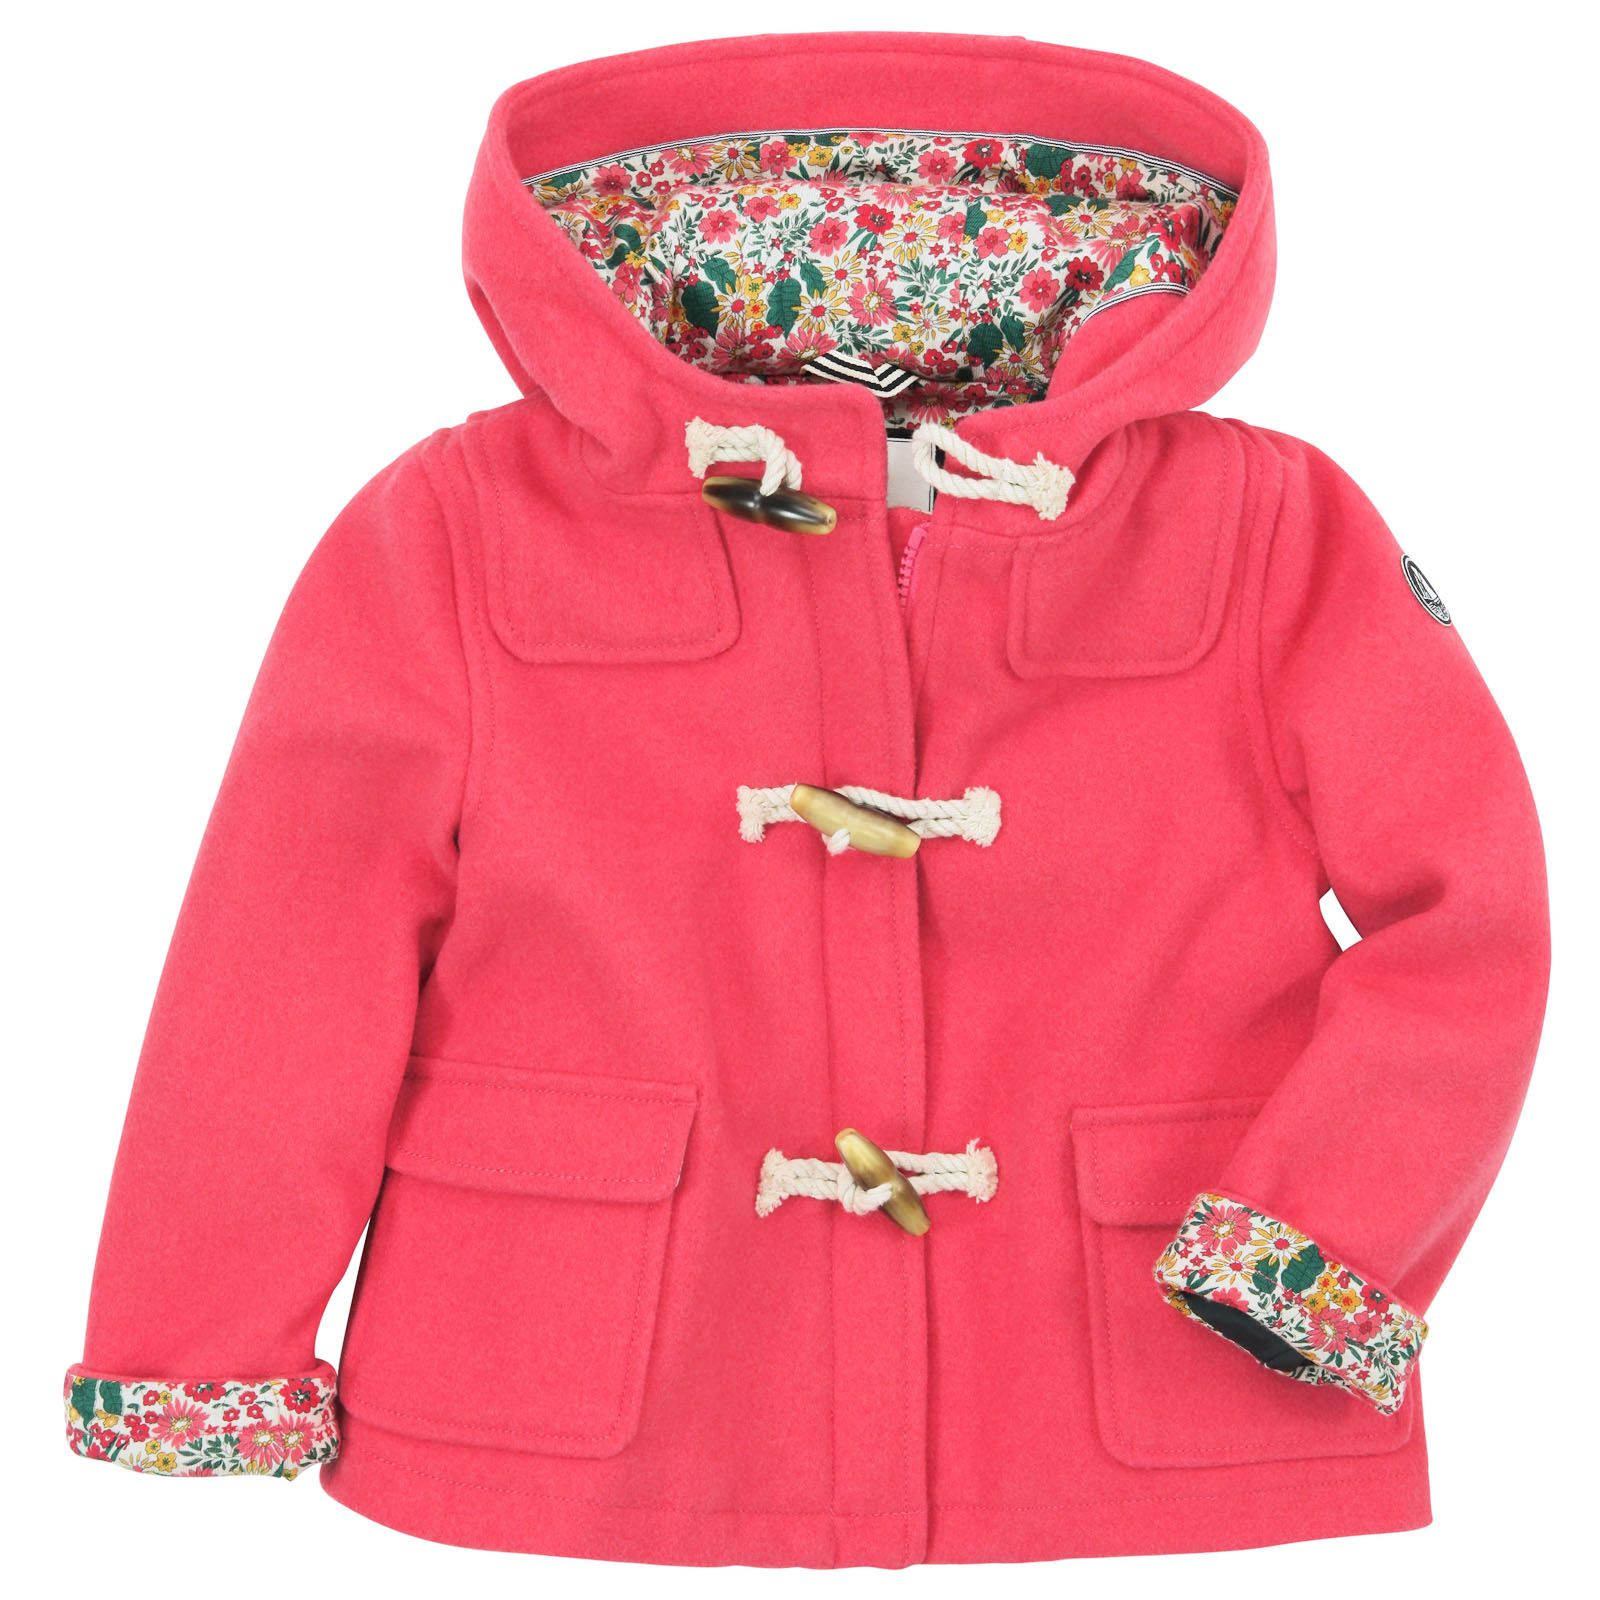 Petit Bateau Coral woollen cloth duffle coat Coral - 49745 ...